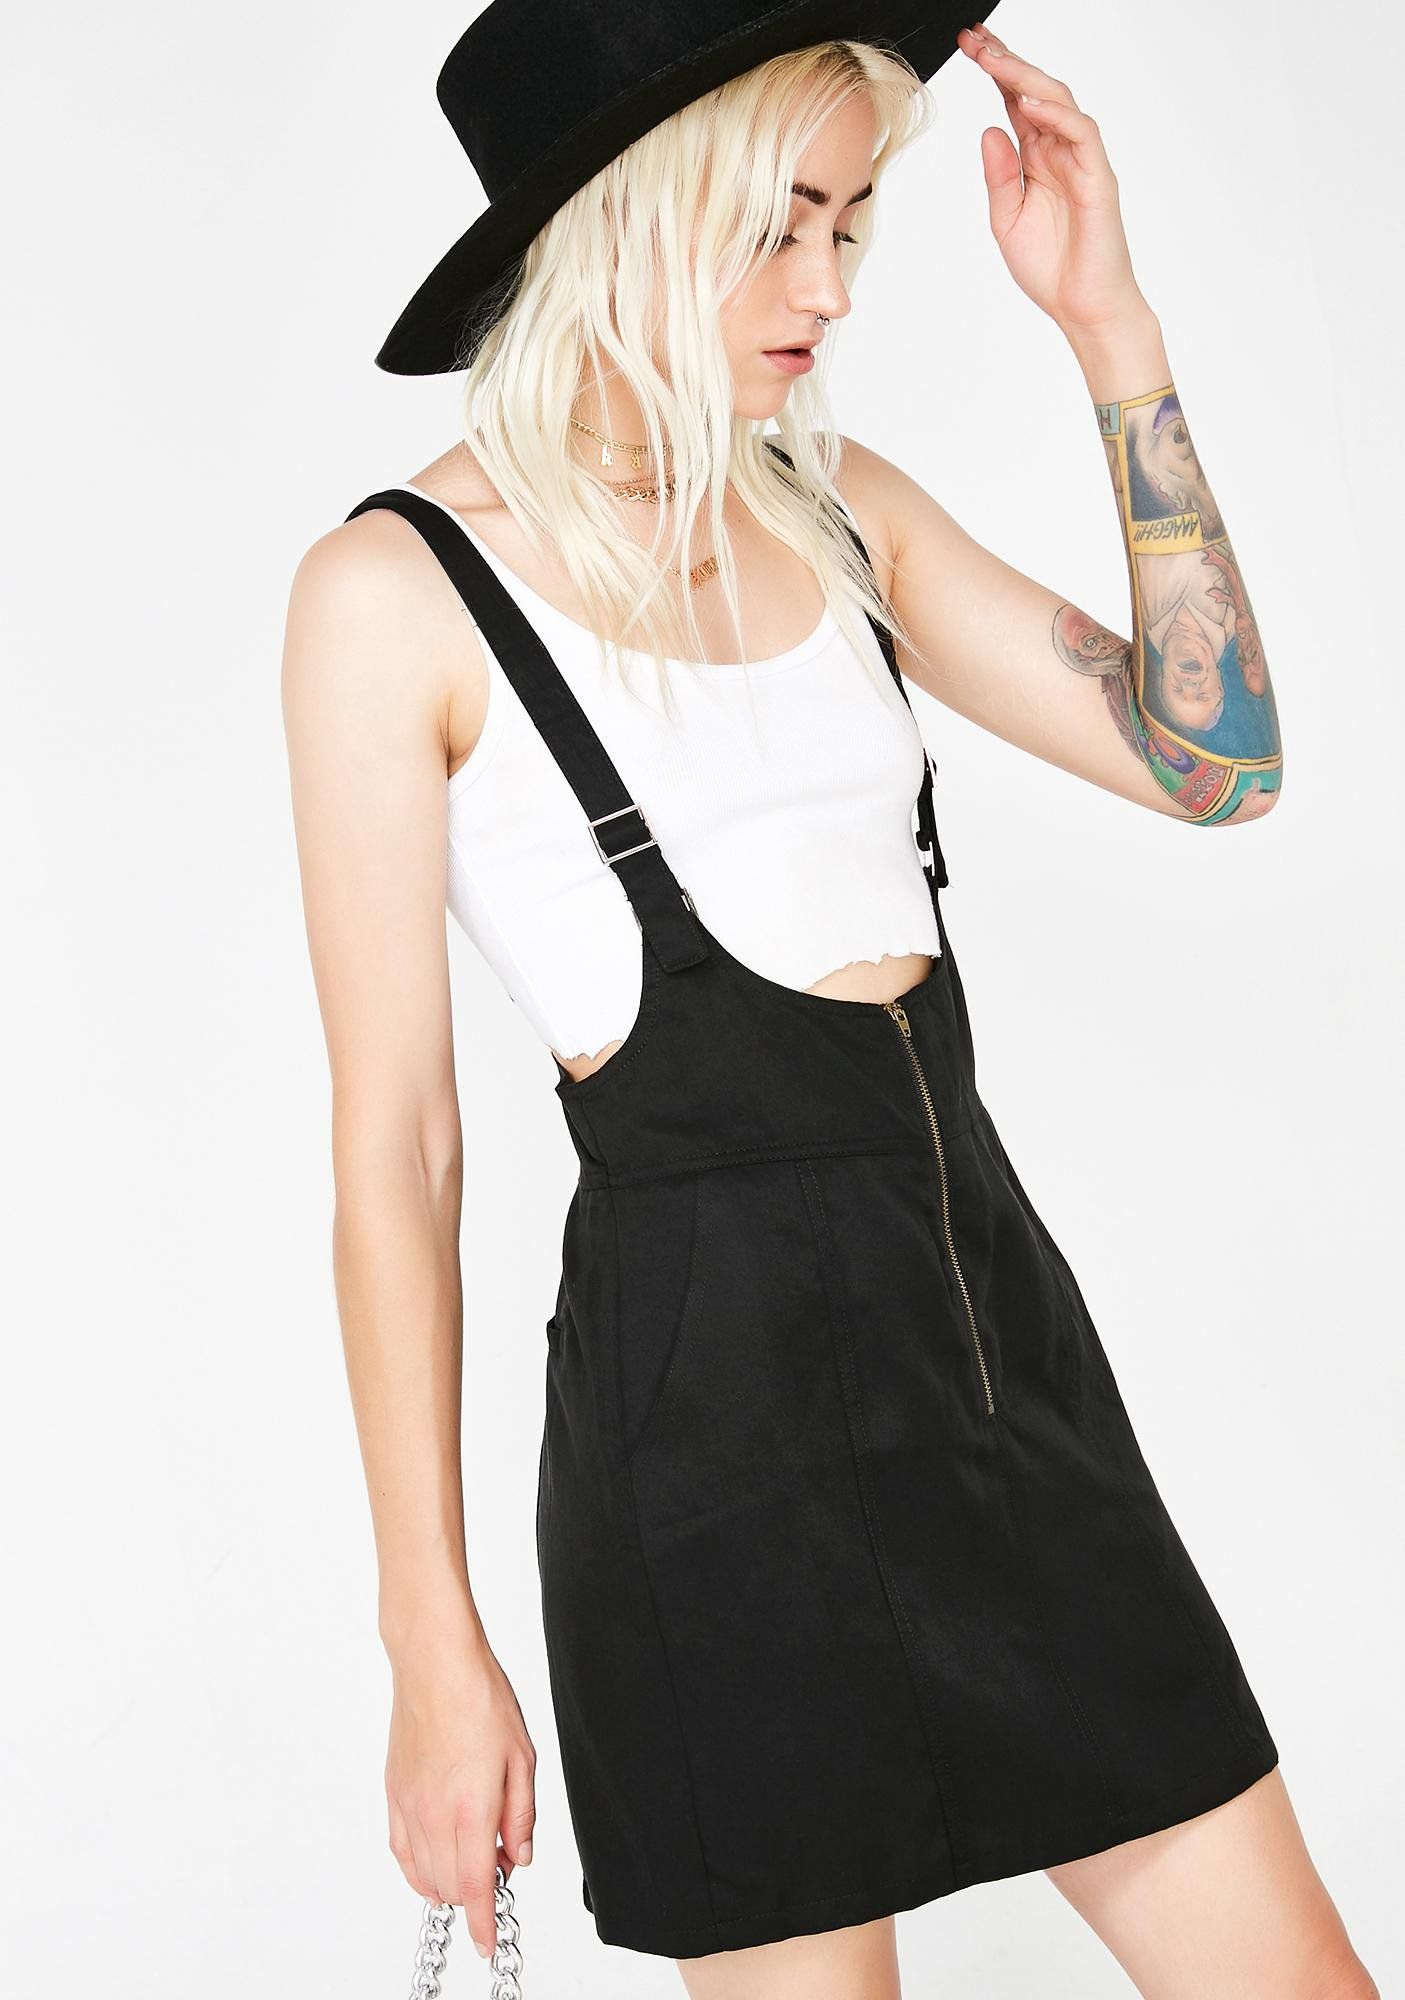 590624f649fe Mile High Club Suspender Dress   Dolls Kill WL   Suspender dress ...